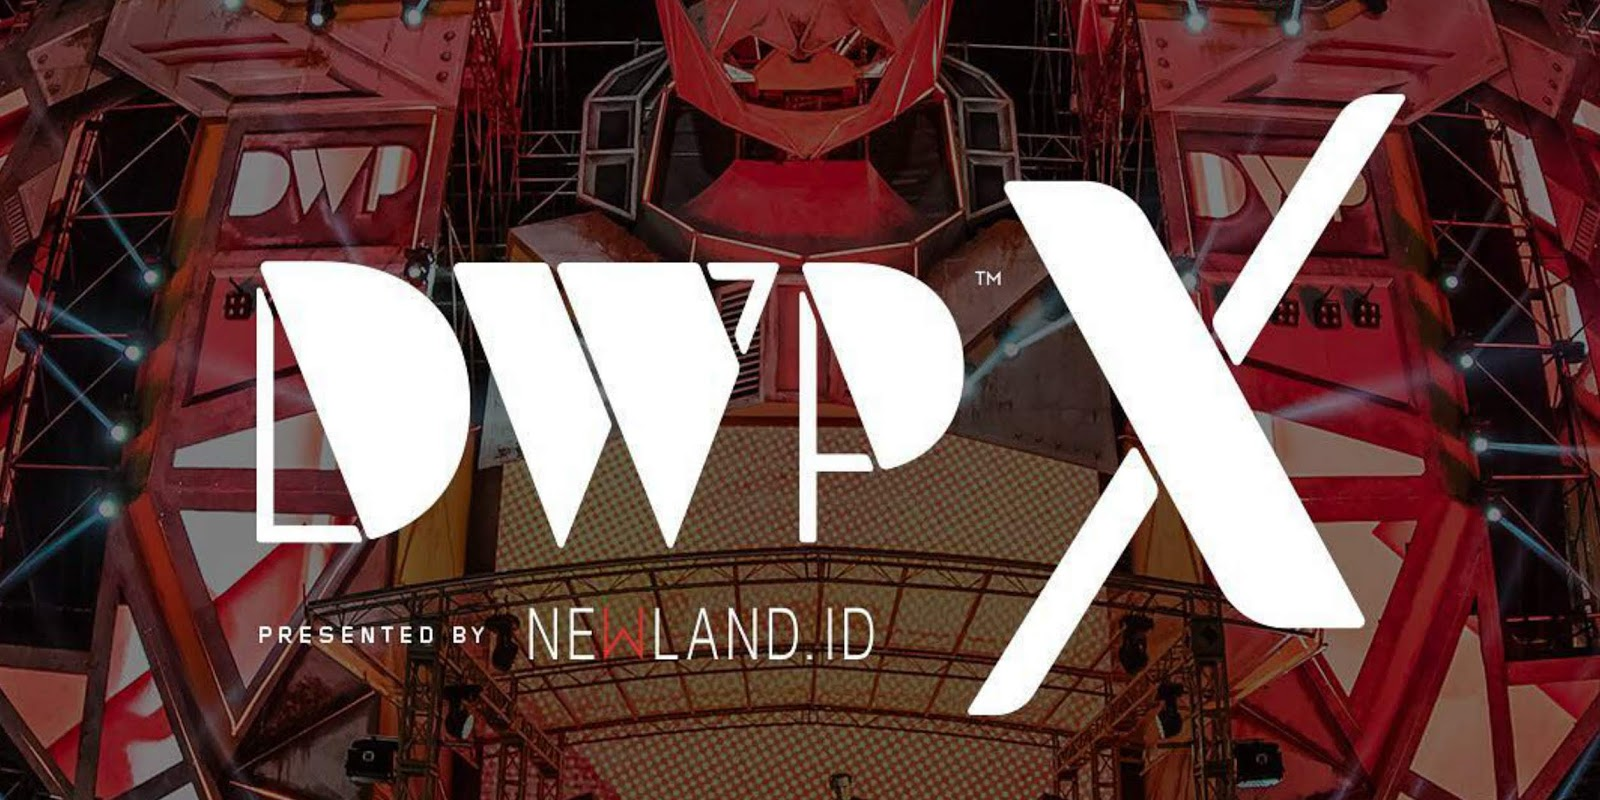 Dwpx 10th Anniversary Edition 2018 Floxille Art Tiket Dwp Djakarta Warehouse Project 2017 2 Day Pass A List Aftermovie Buy Tickets